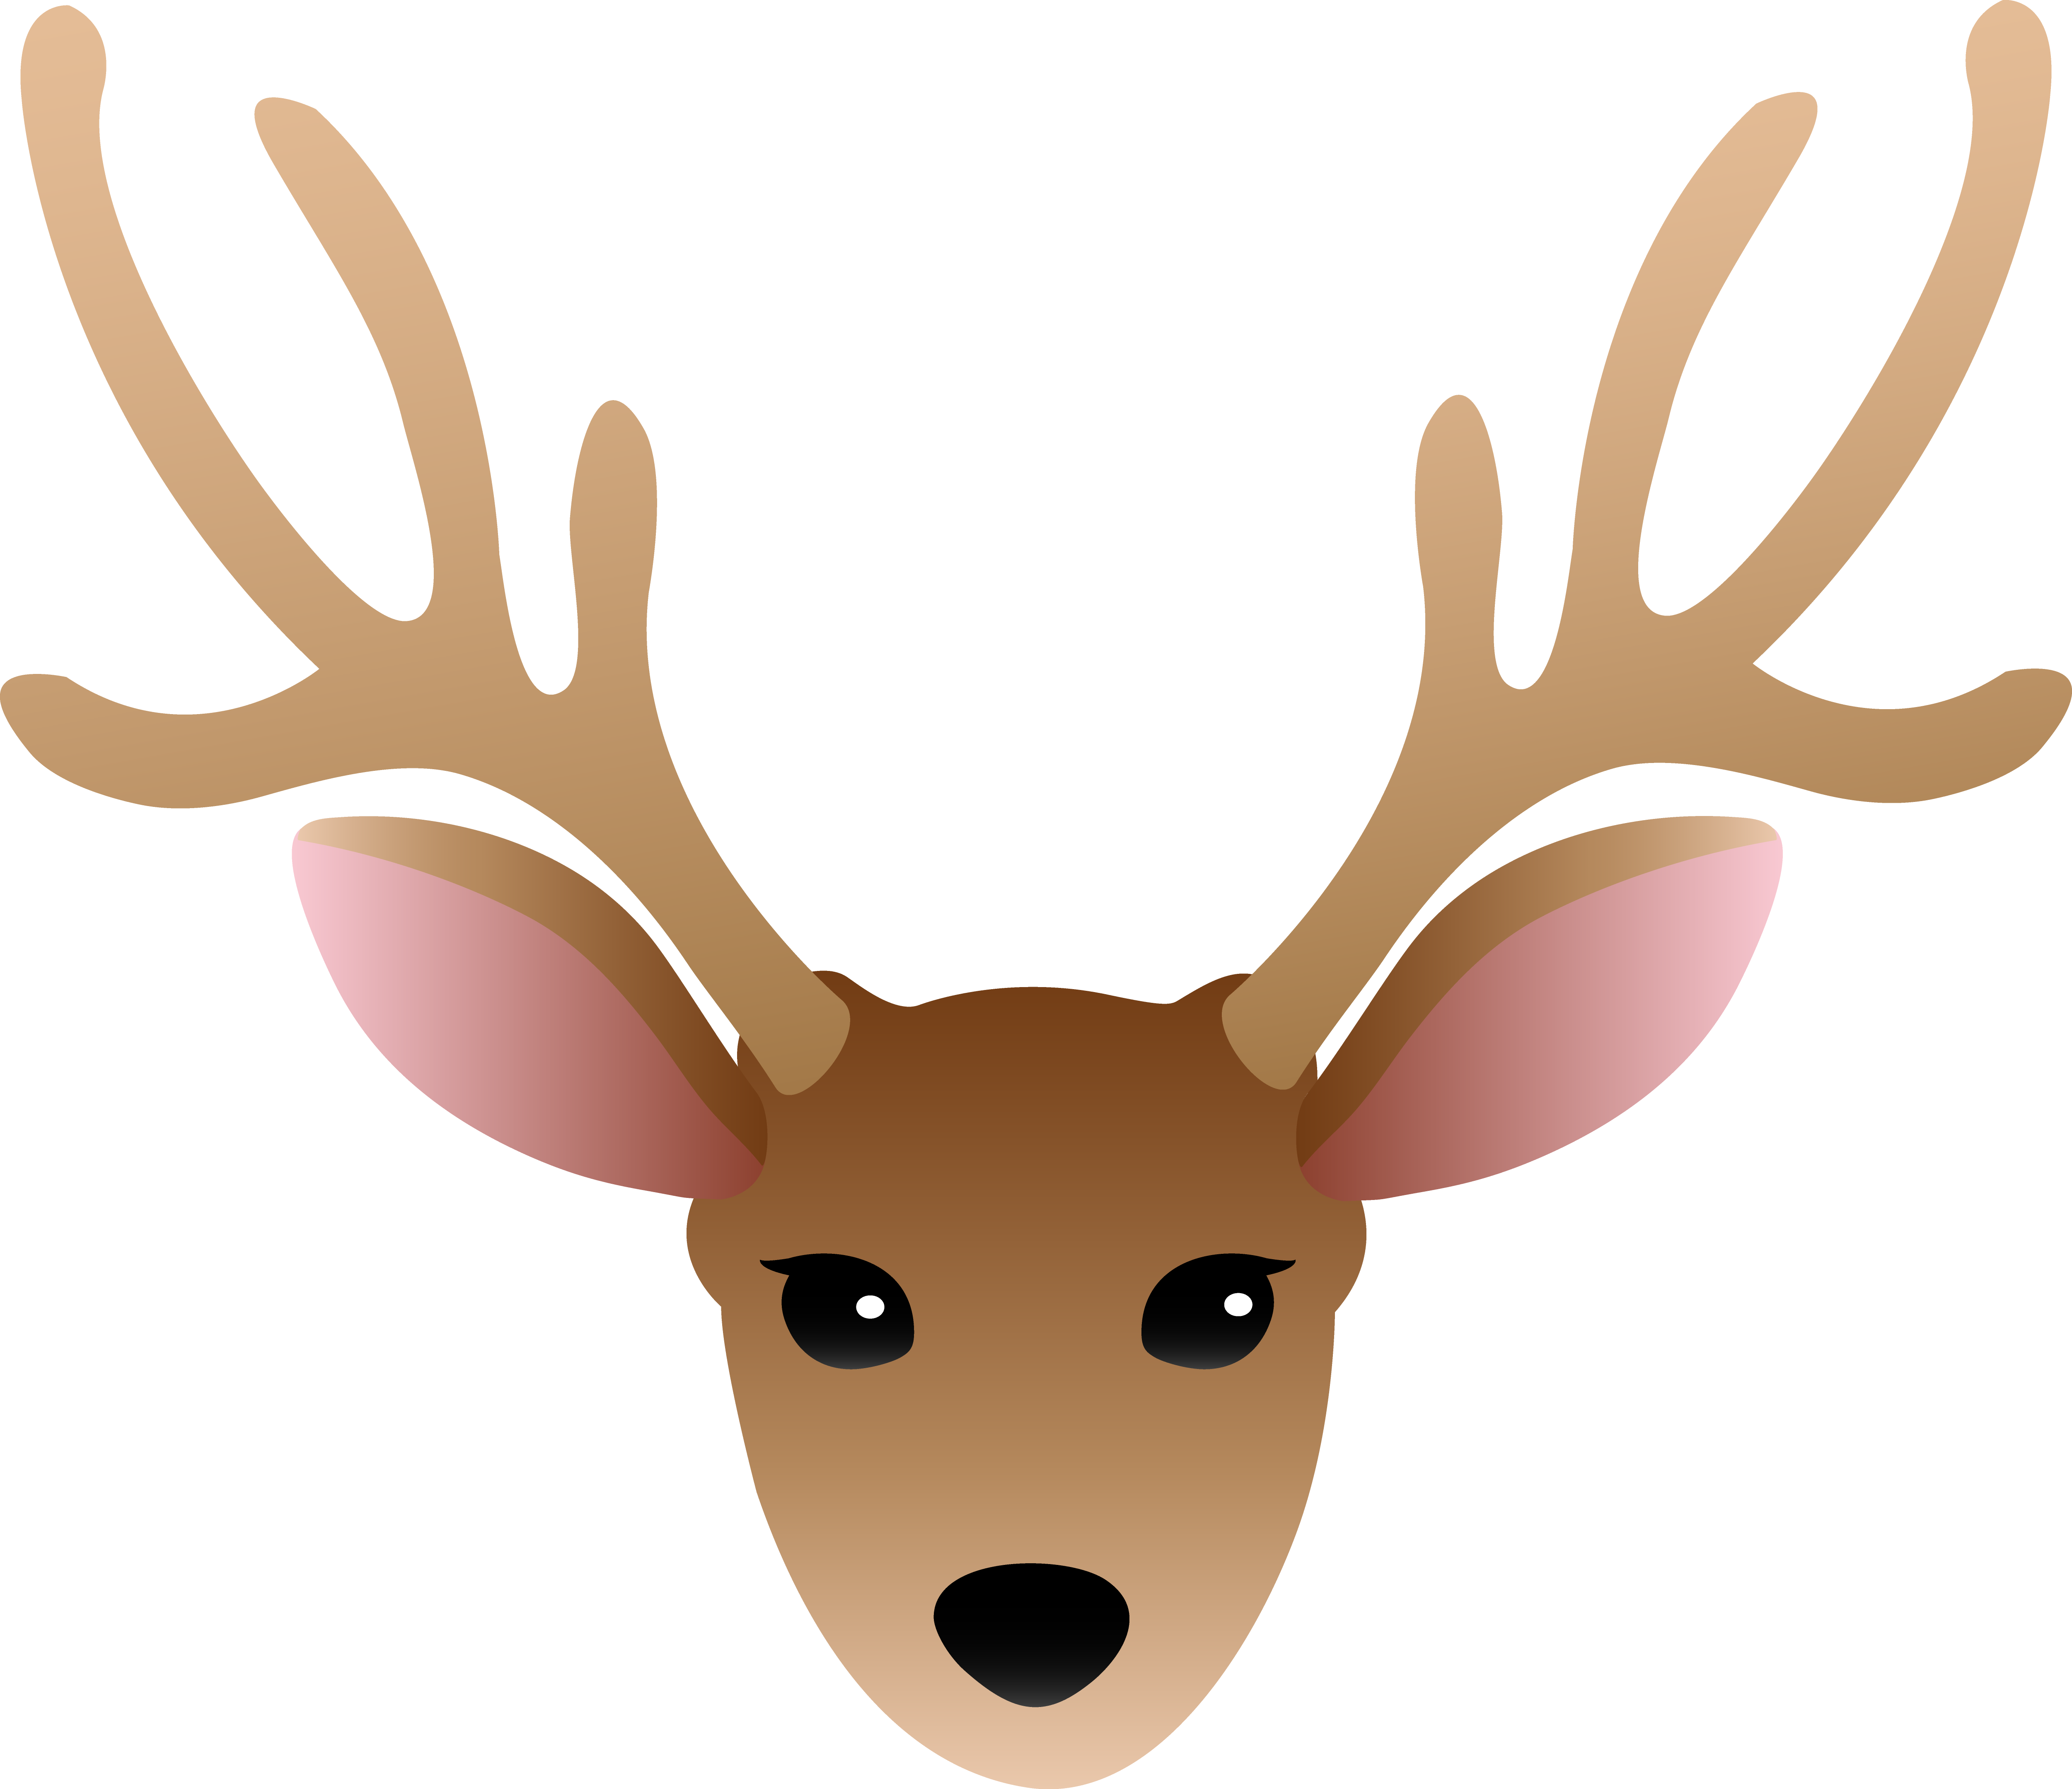 Cartoon Deer Head Clipart free image.